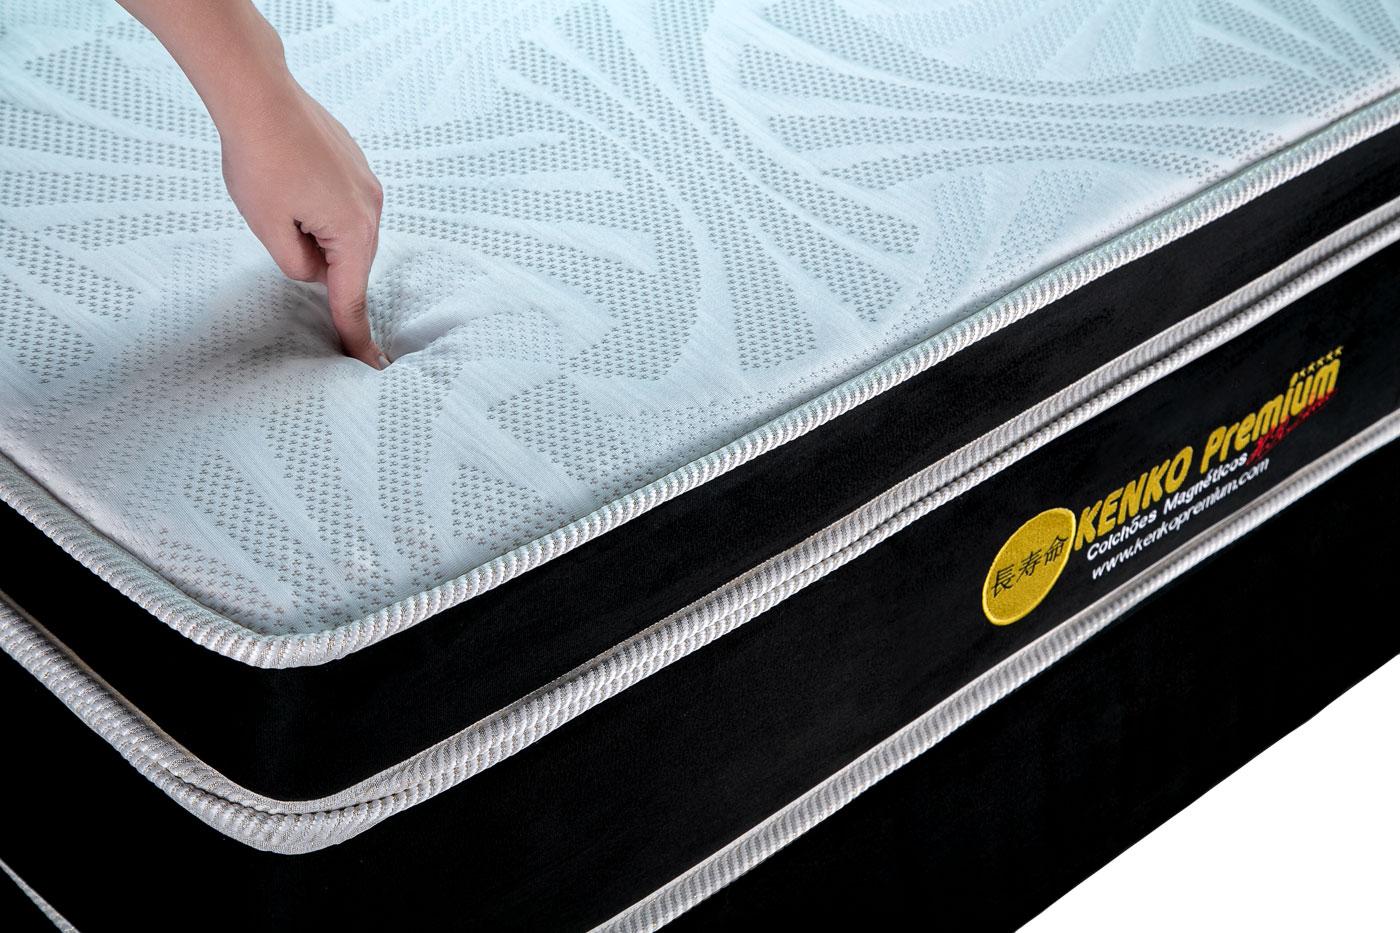 Colchão Magnético Kenko Premium, HR 29cm Látex + Massagem + Cromo - King Size 1,93X2,03  - Kenko Premium Colchões